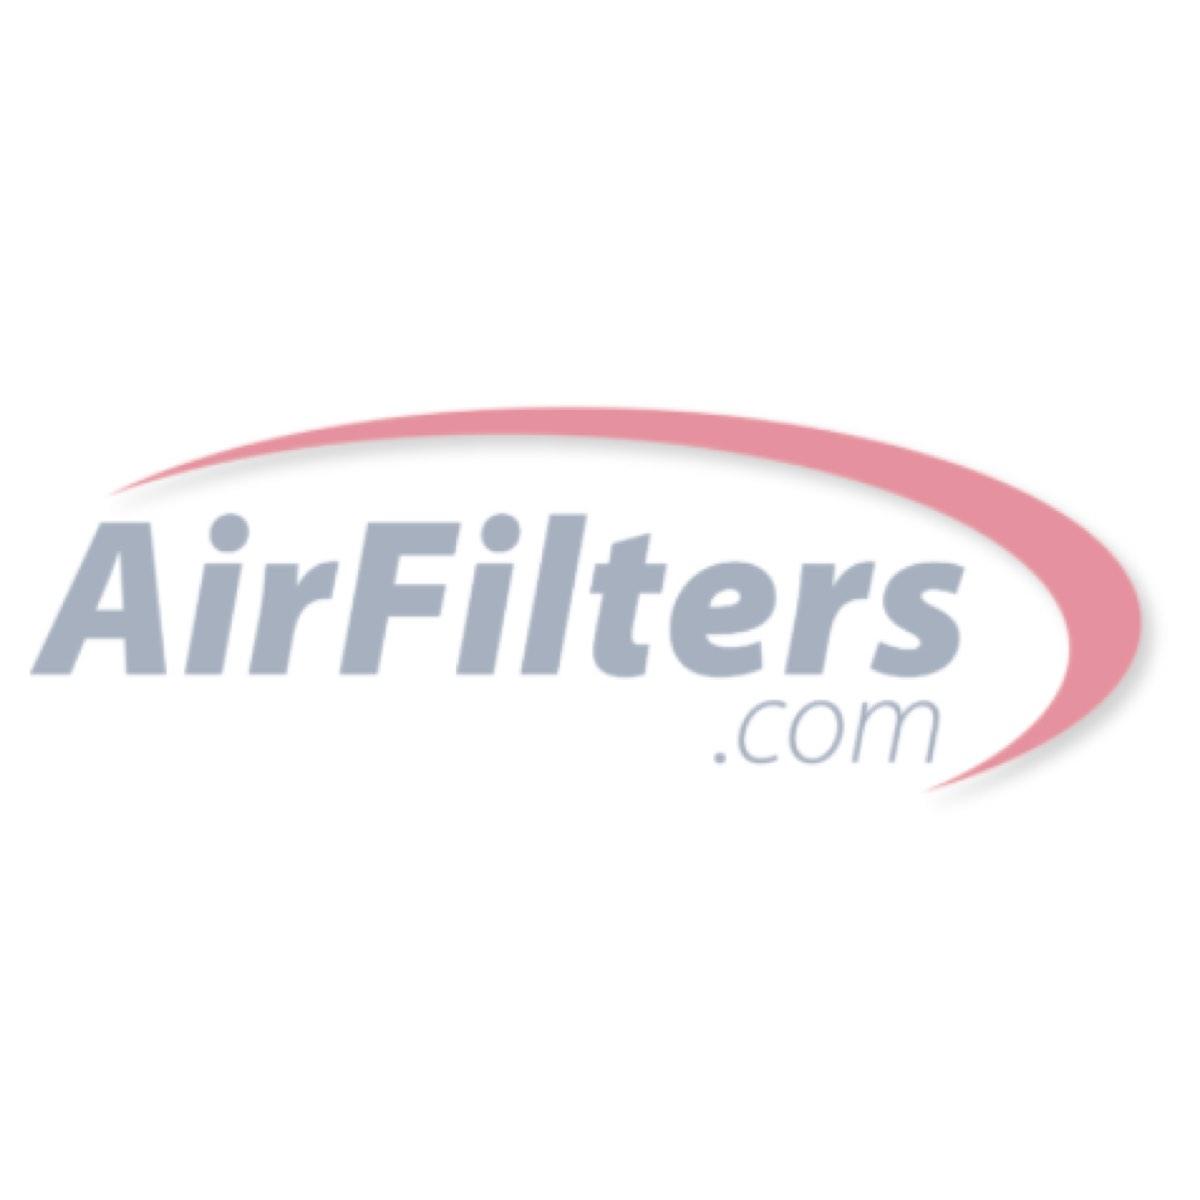 Accumulair Gold MERV 8 Filters - 1/2 Inch